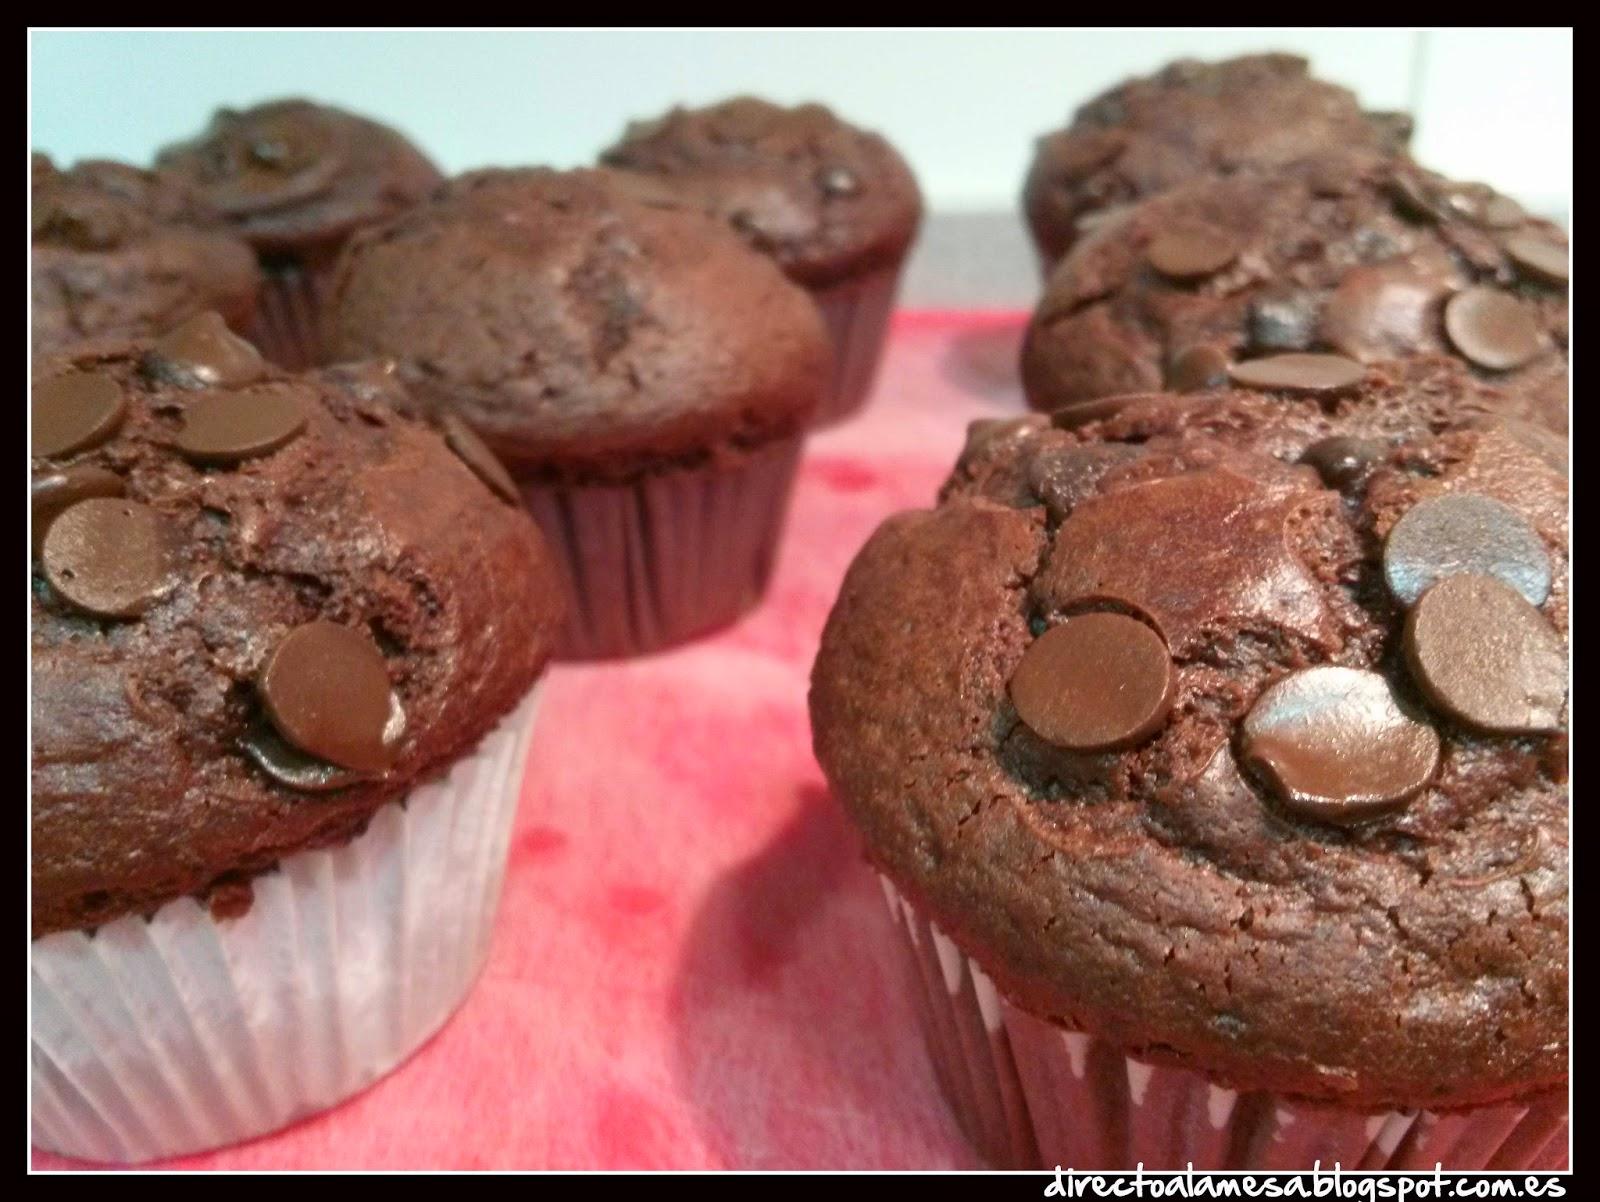 http://directoalamesa.blogspot.com.es/2014/05/muffins-de-chocolate.html